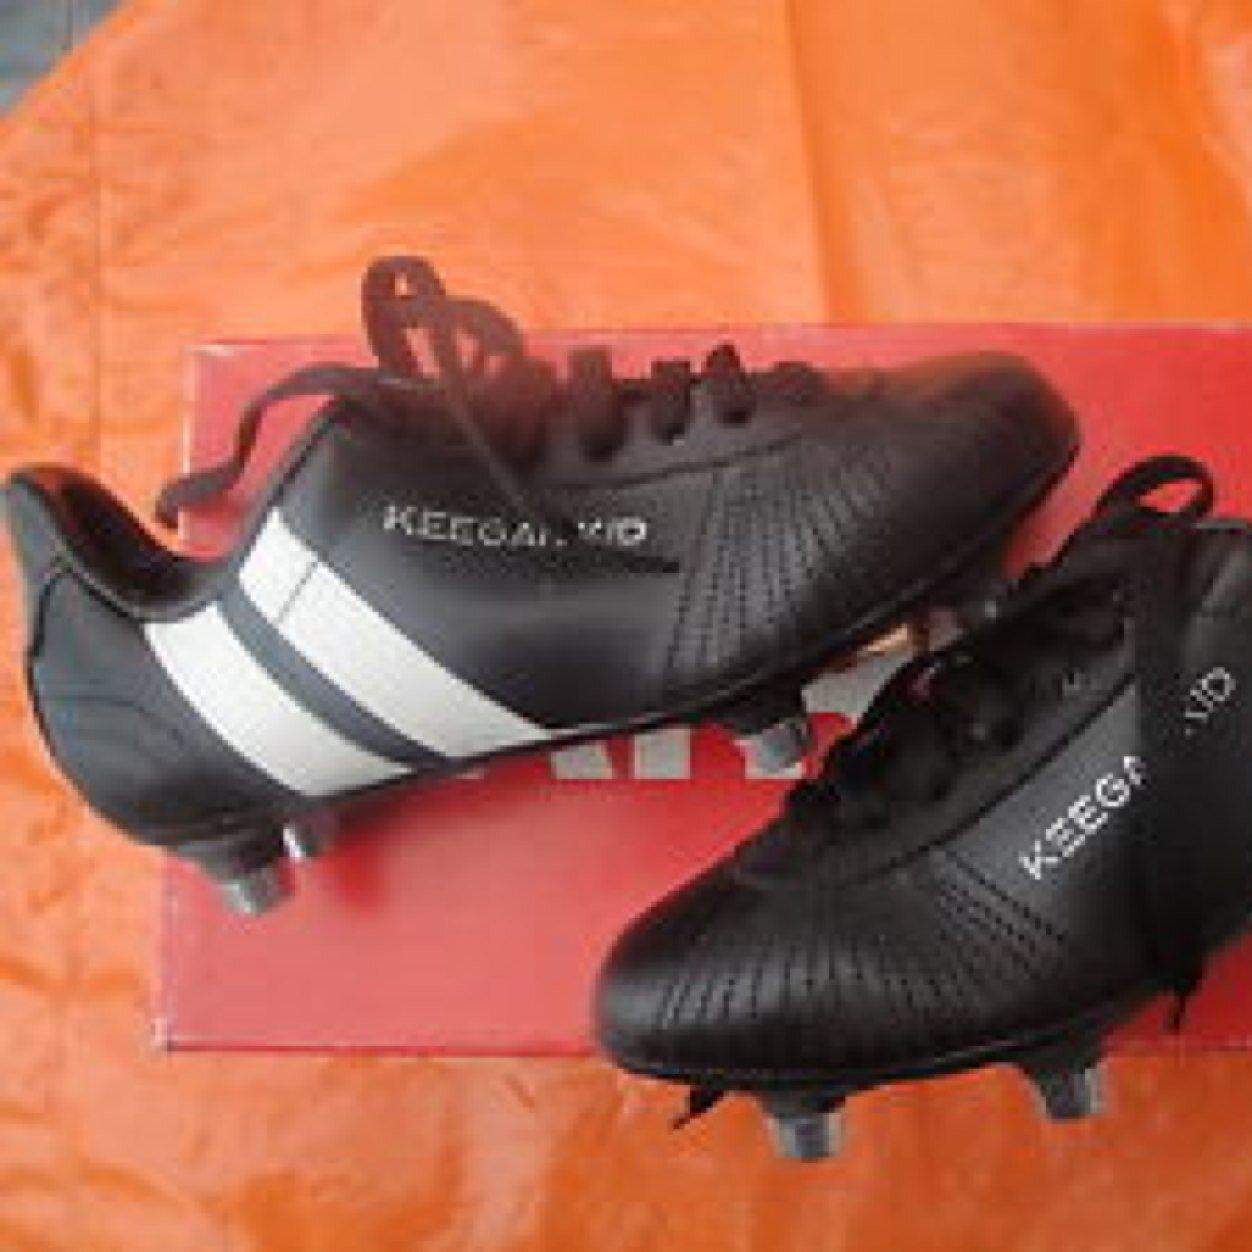 footy boots were Patrick Keegan Kid